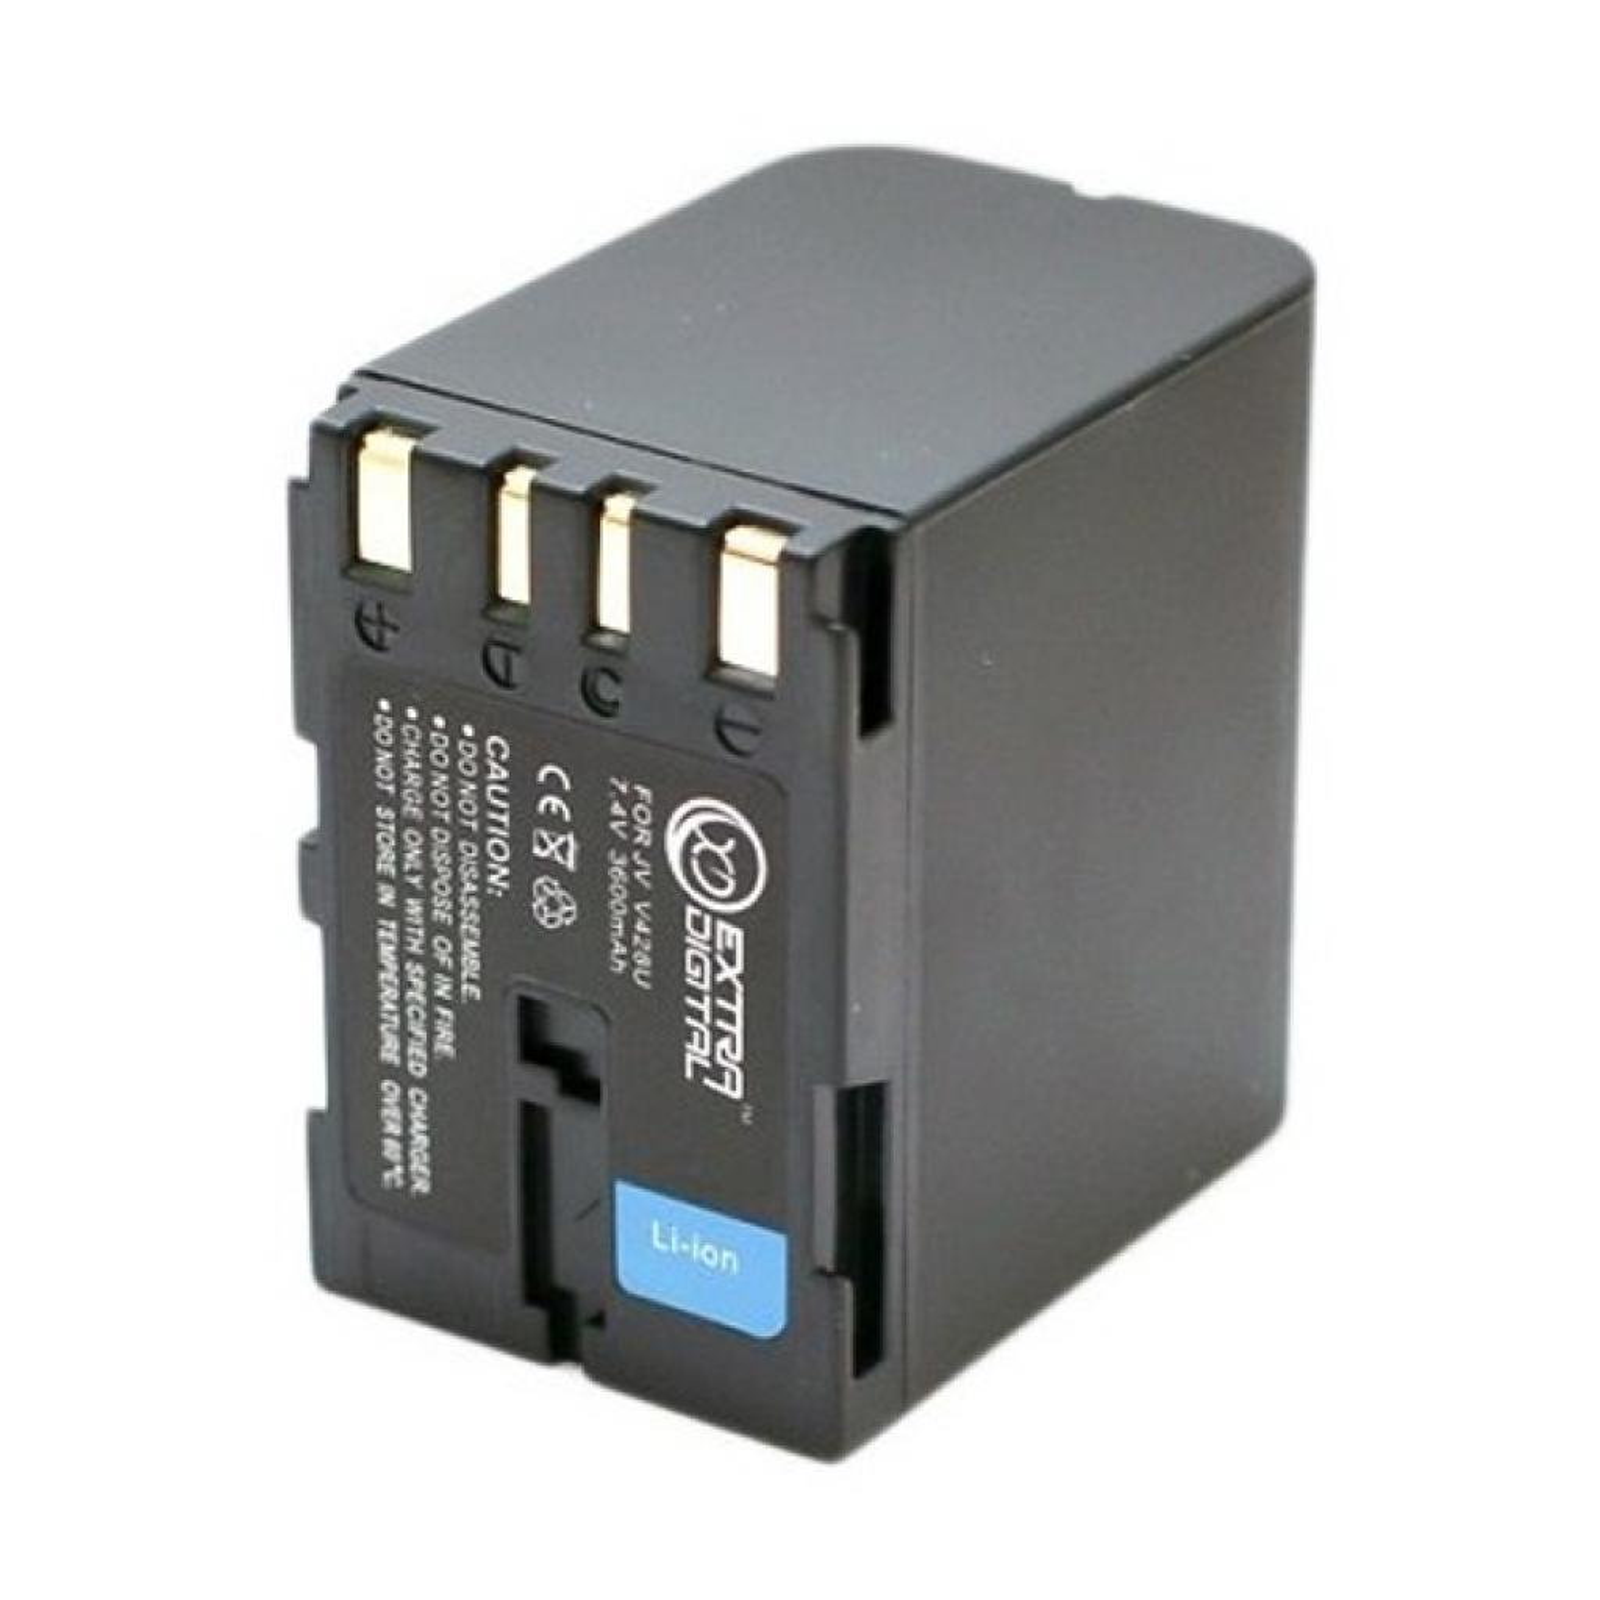 Аккумулятор к фото/видео EXTRADIGITAL JVC BN-V428 (DV00DV1086) изображение 2